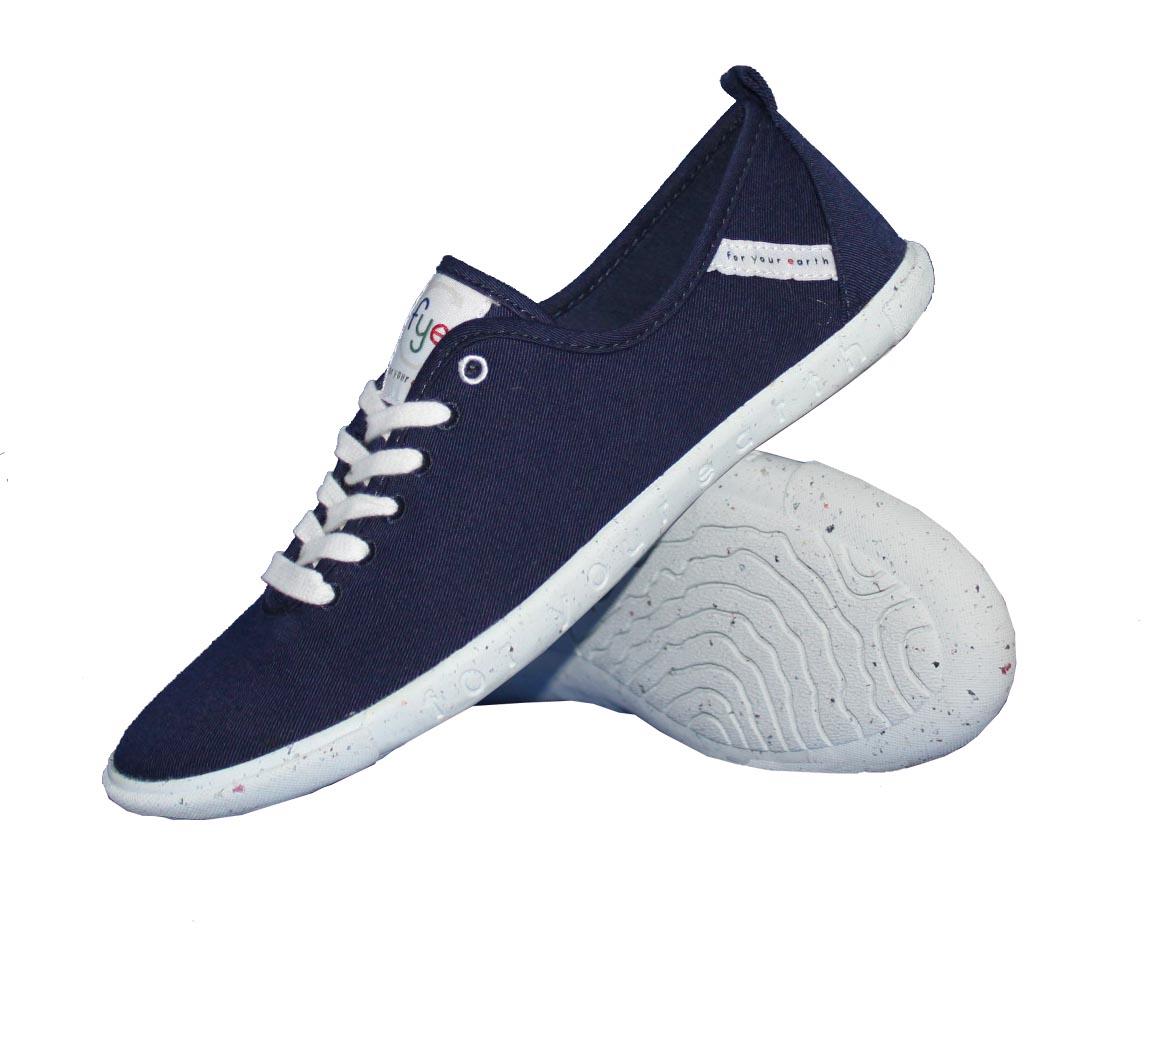 chaussure femme bleue basket cologique fye pas cher. Black Bedroom Furniture Sets. Home Design Ideas